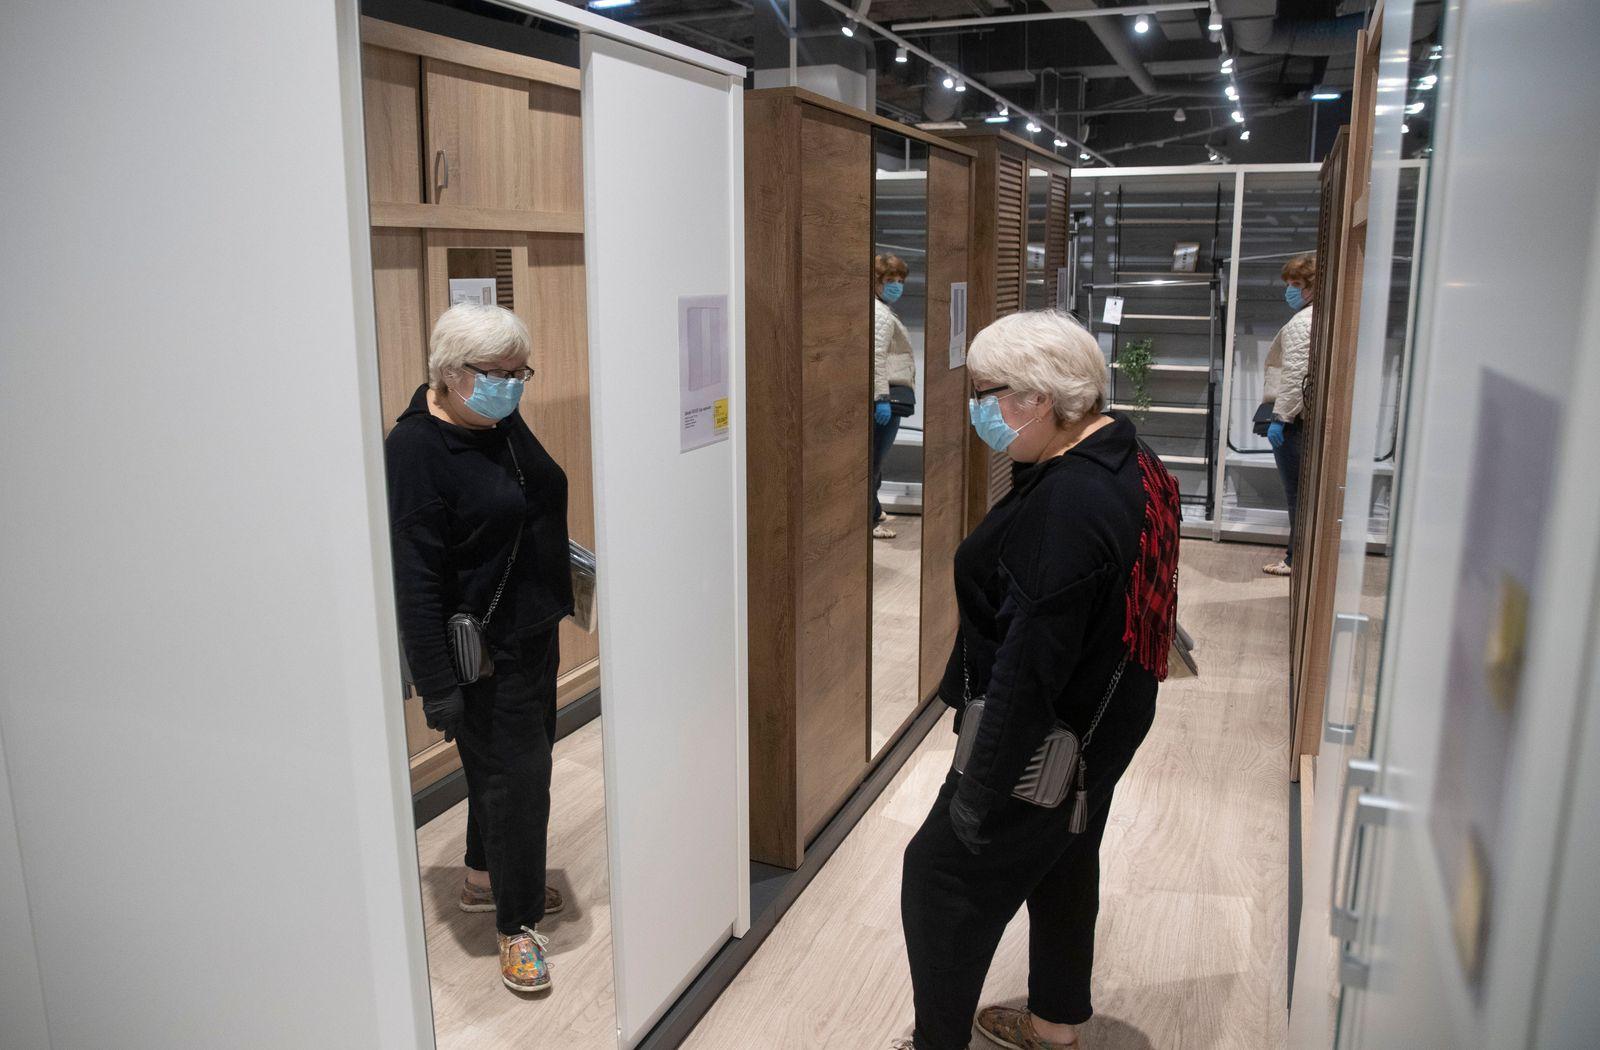 Danish household retailer Jysk opens fist offline store in Moscow, Russian Federation - 04 Jun 2020